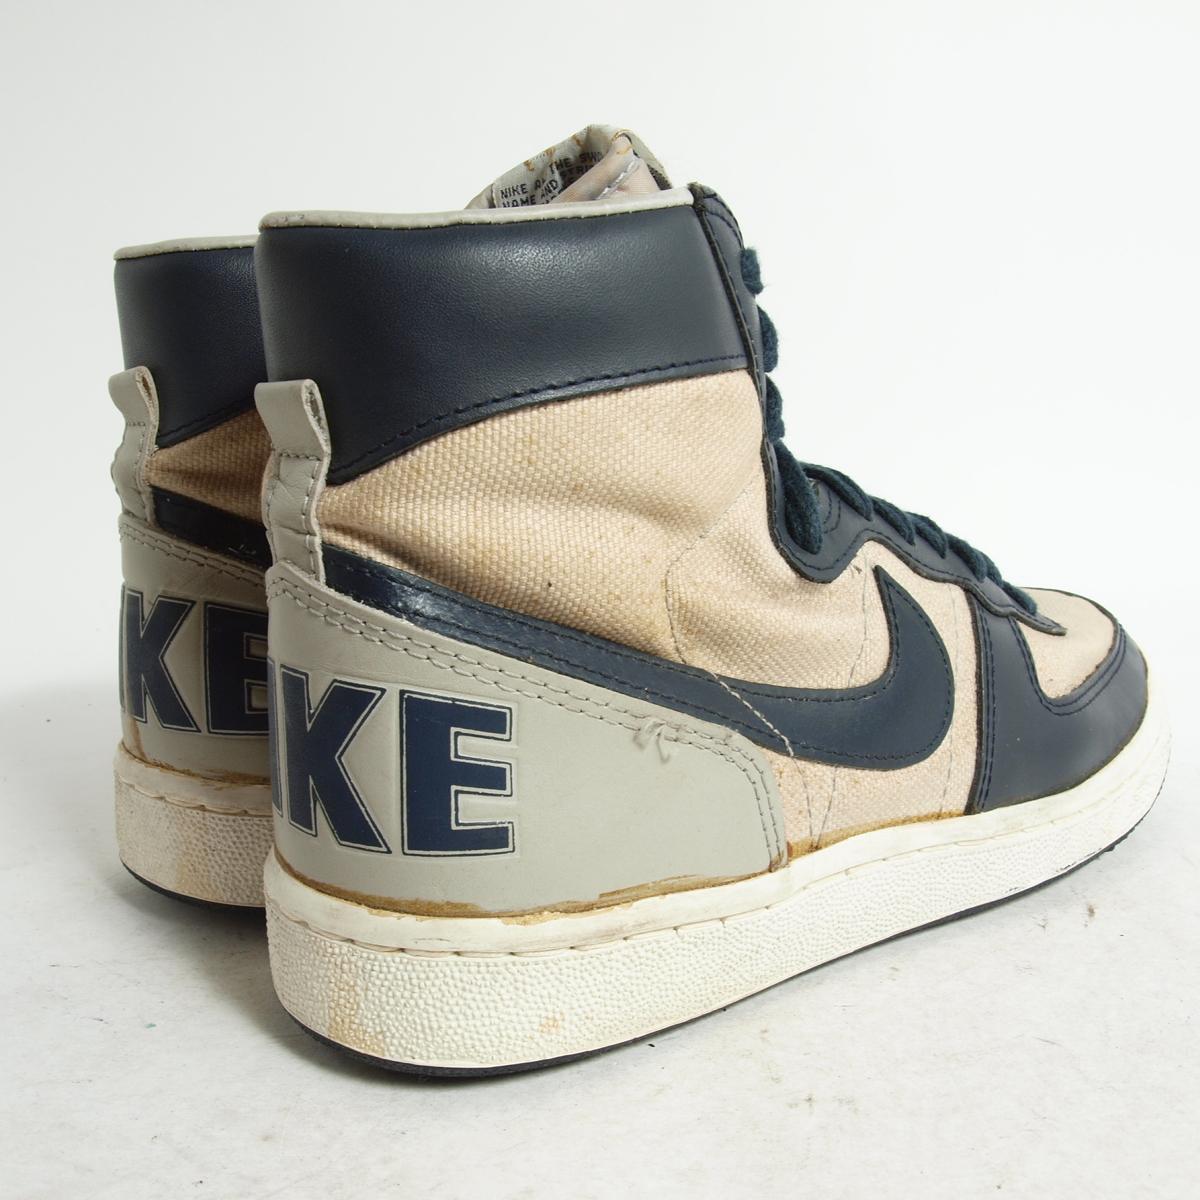 huge discount 9d9cd 948dc Sneakers US8 .5 mens 26.5cm vintage NIKE bok8091 in the 80s made in Nike  TERMINATOR HIGH terminator canvas Korea